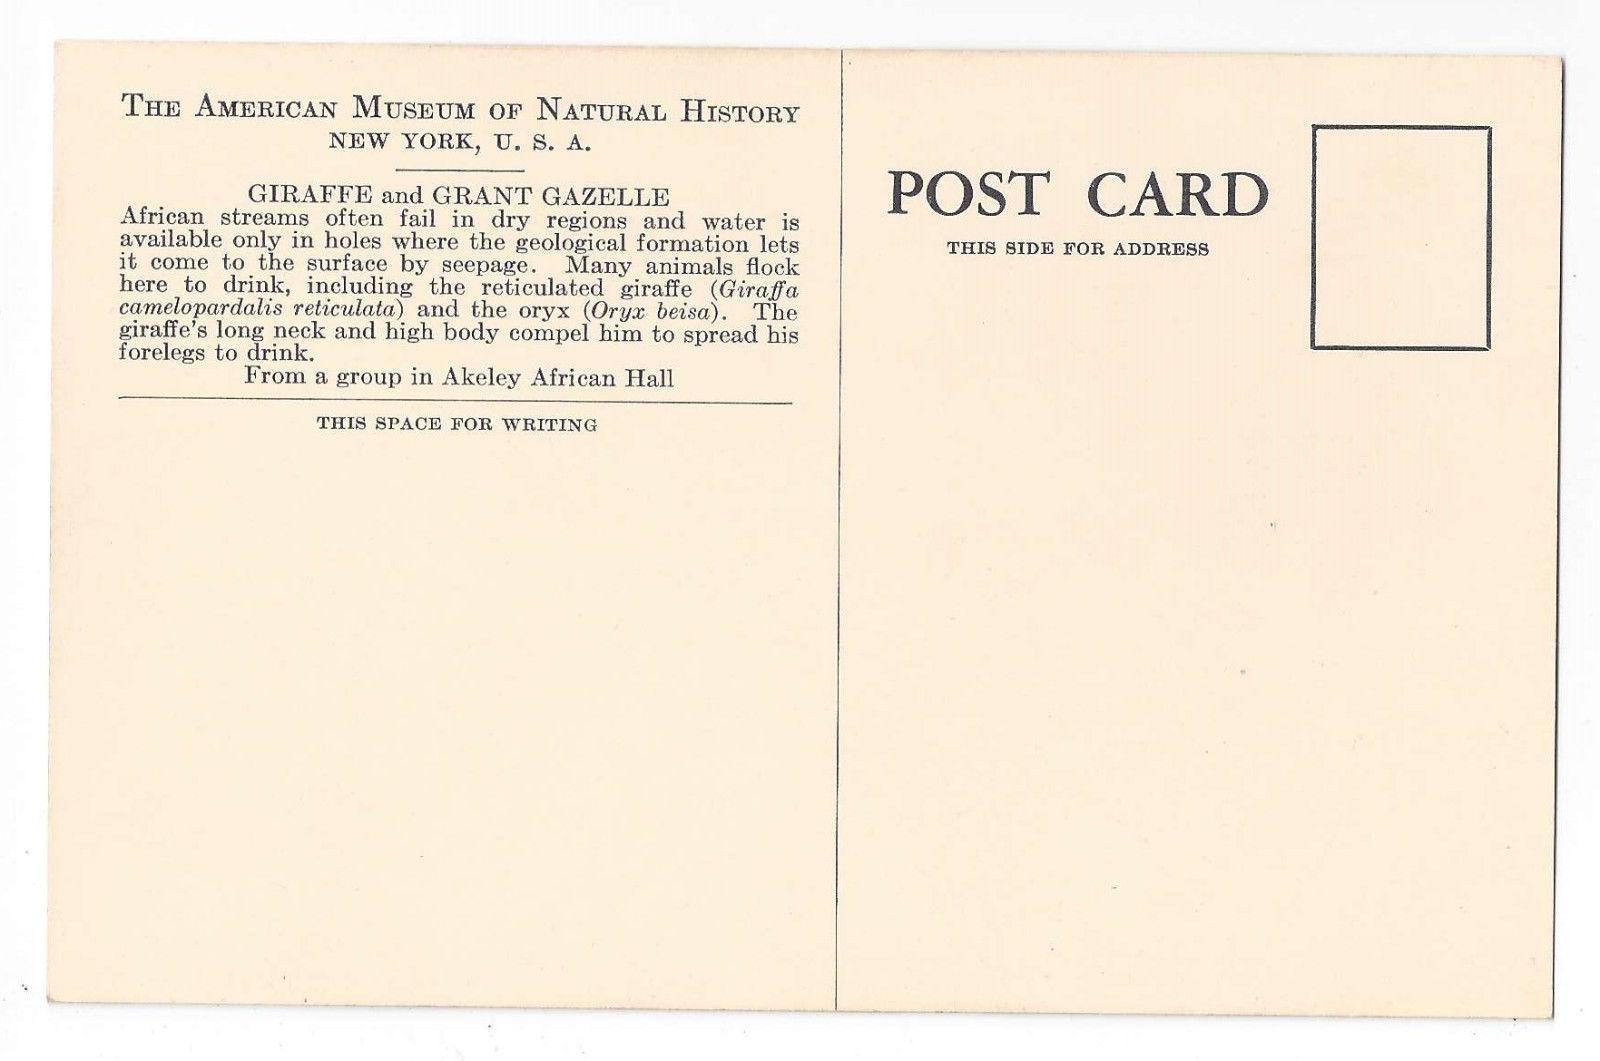 American Museum Natural History African Giraffe Grant Gazelle Exhibit Postcard